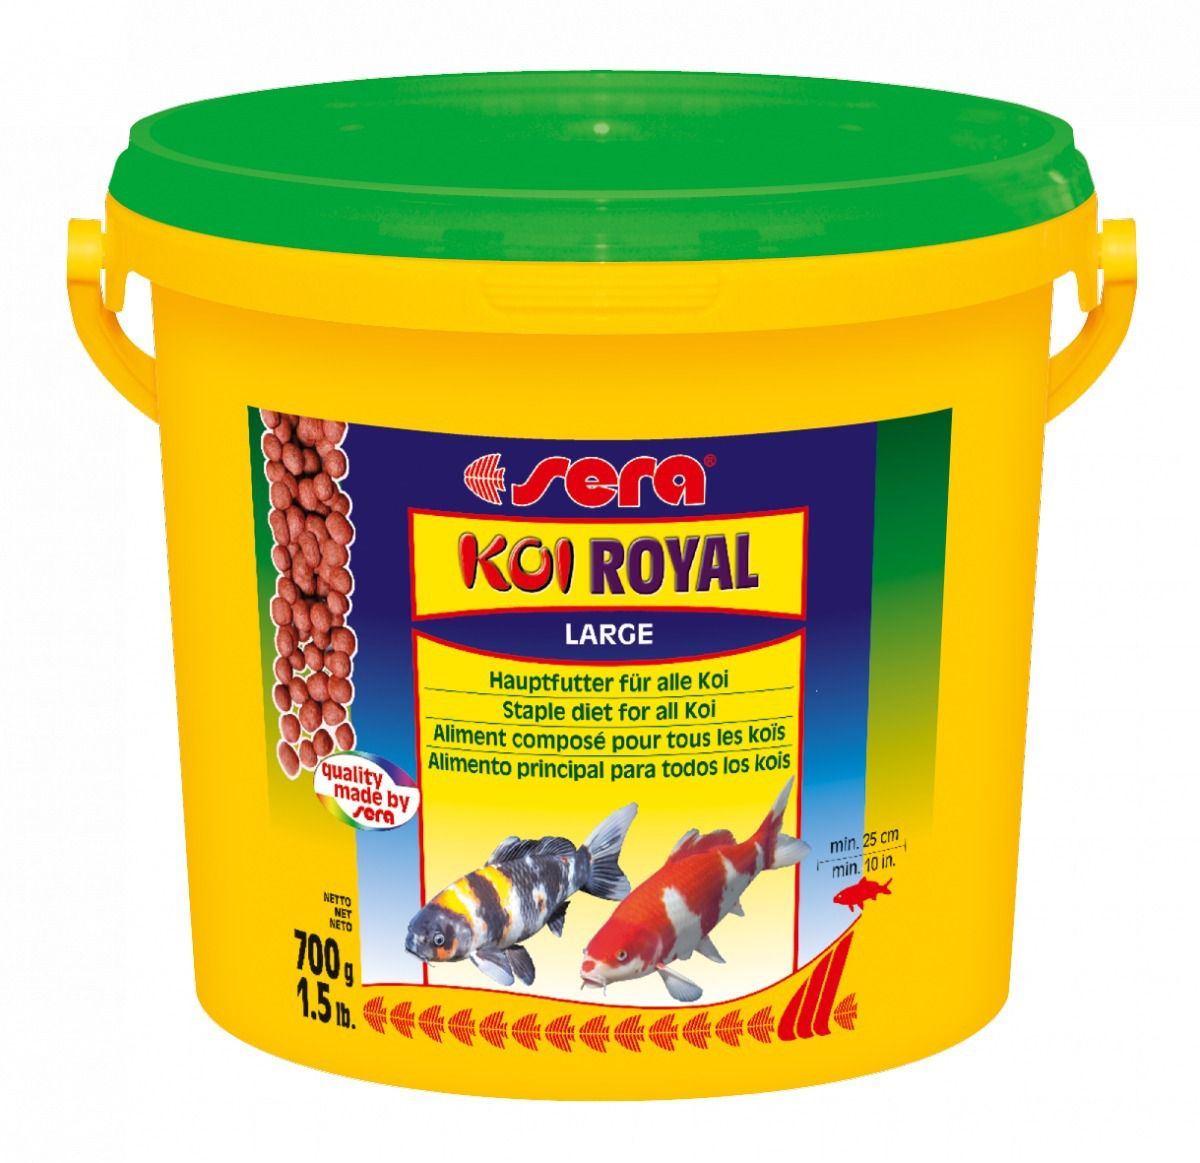 Ração Sera Koi Royal Large 700g - p/ Todas as Carpas Koi